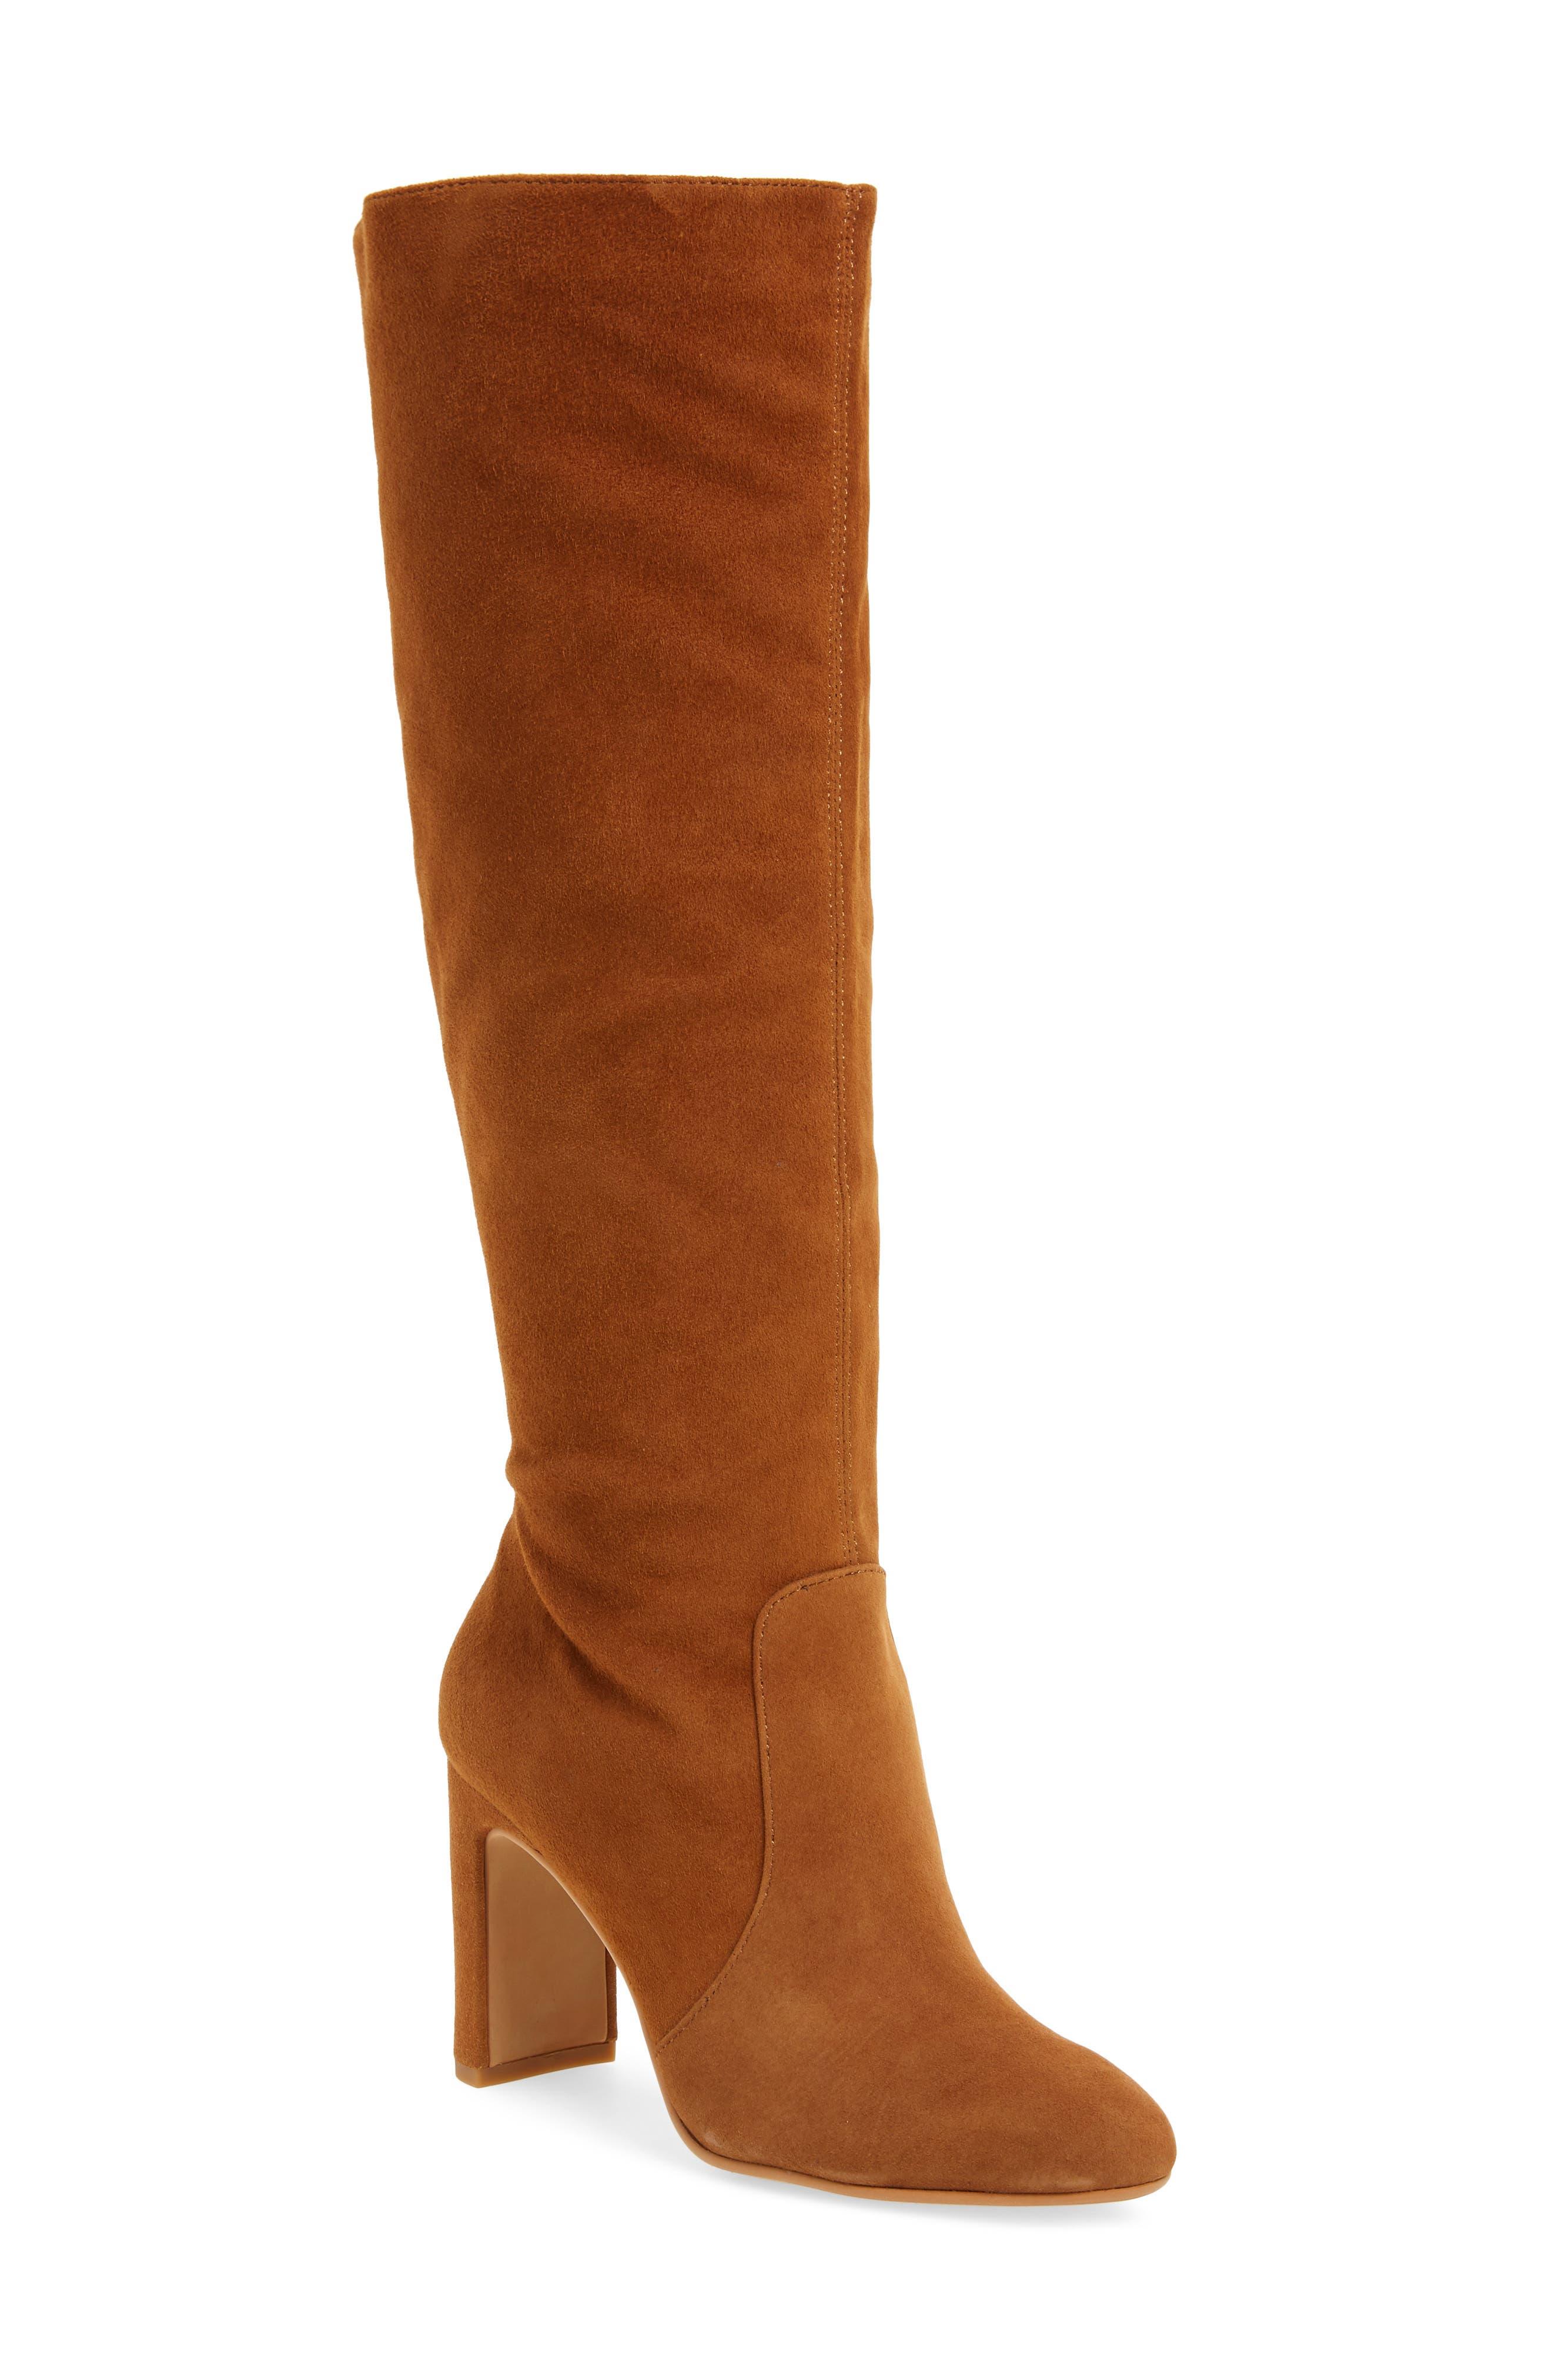 Dolce Vita Coop Knee High Boot, Brown